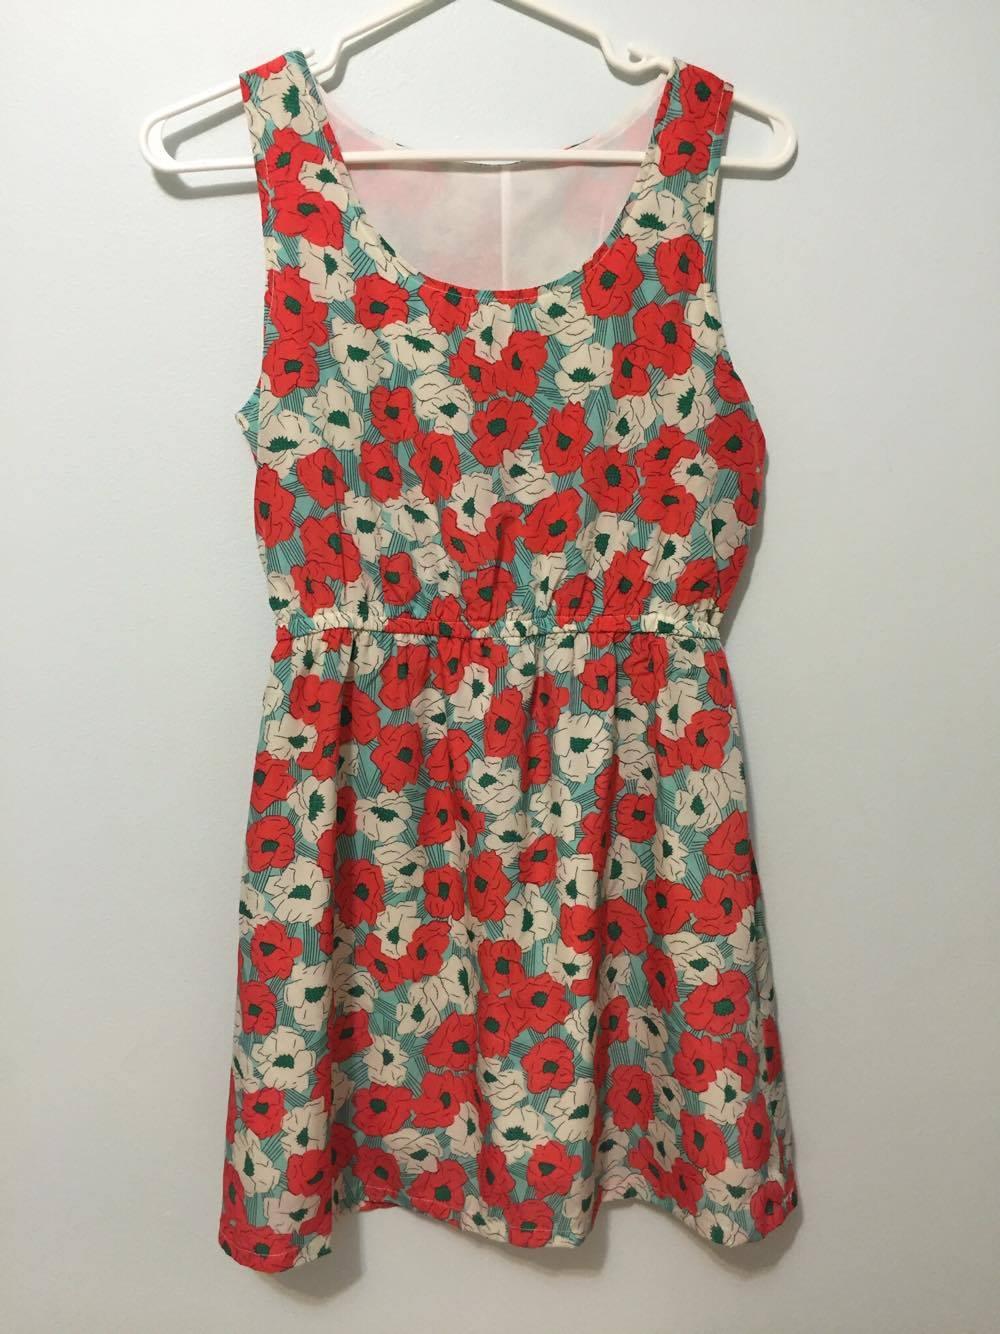 Poppy floral chiffon dress